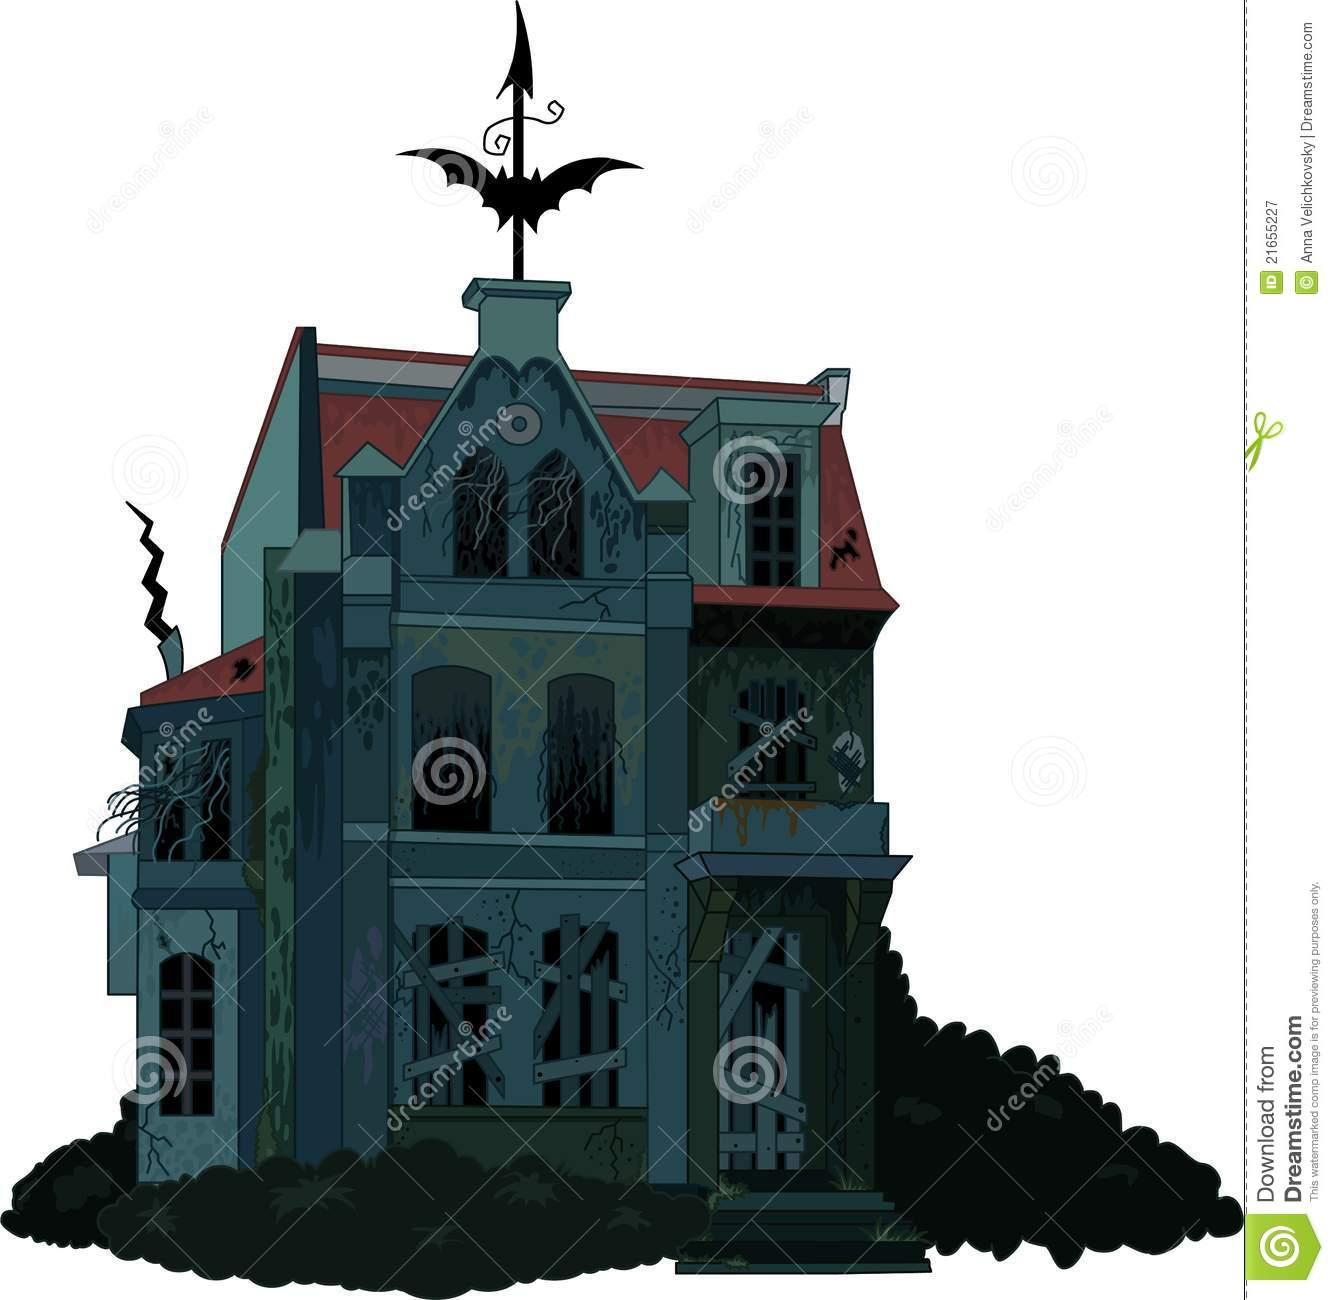 Cartoon Abandoned House Stock Illustrations.